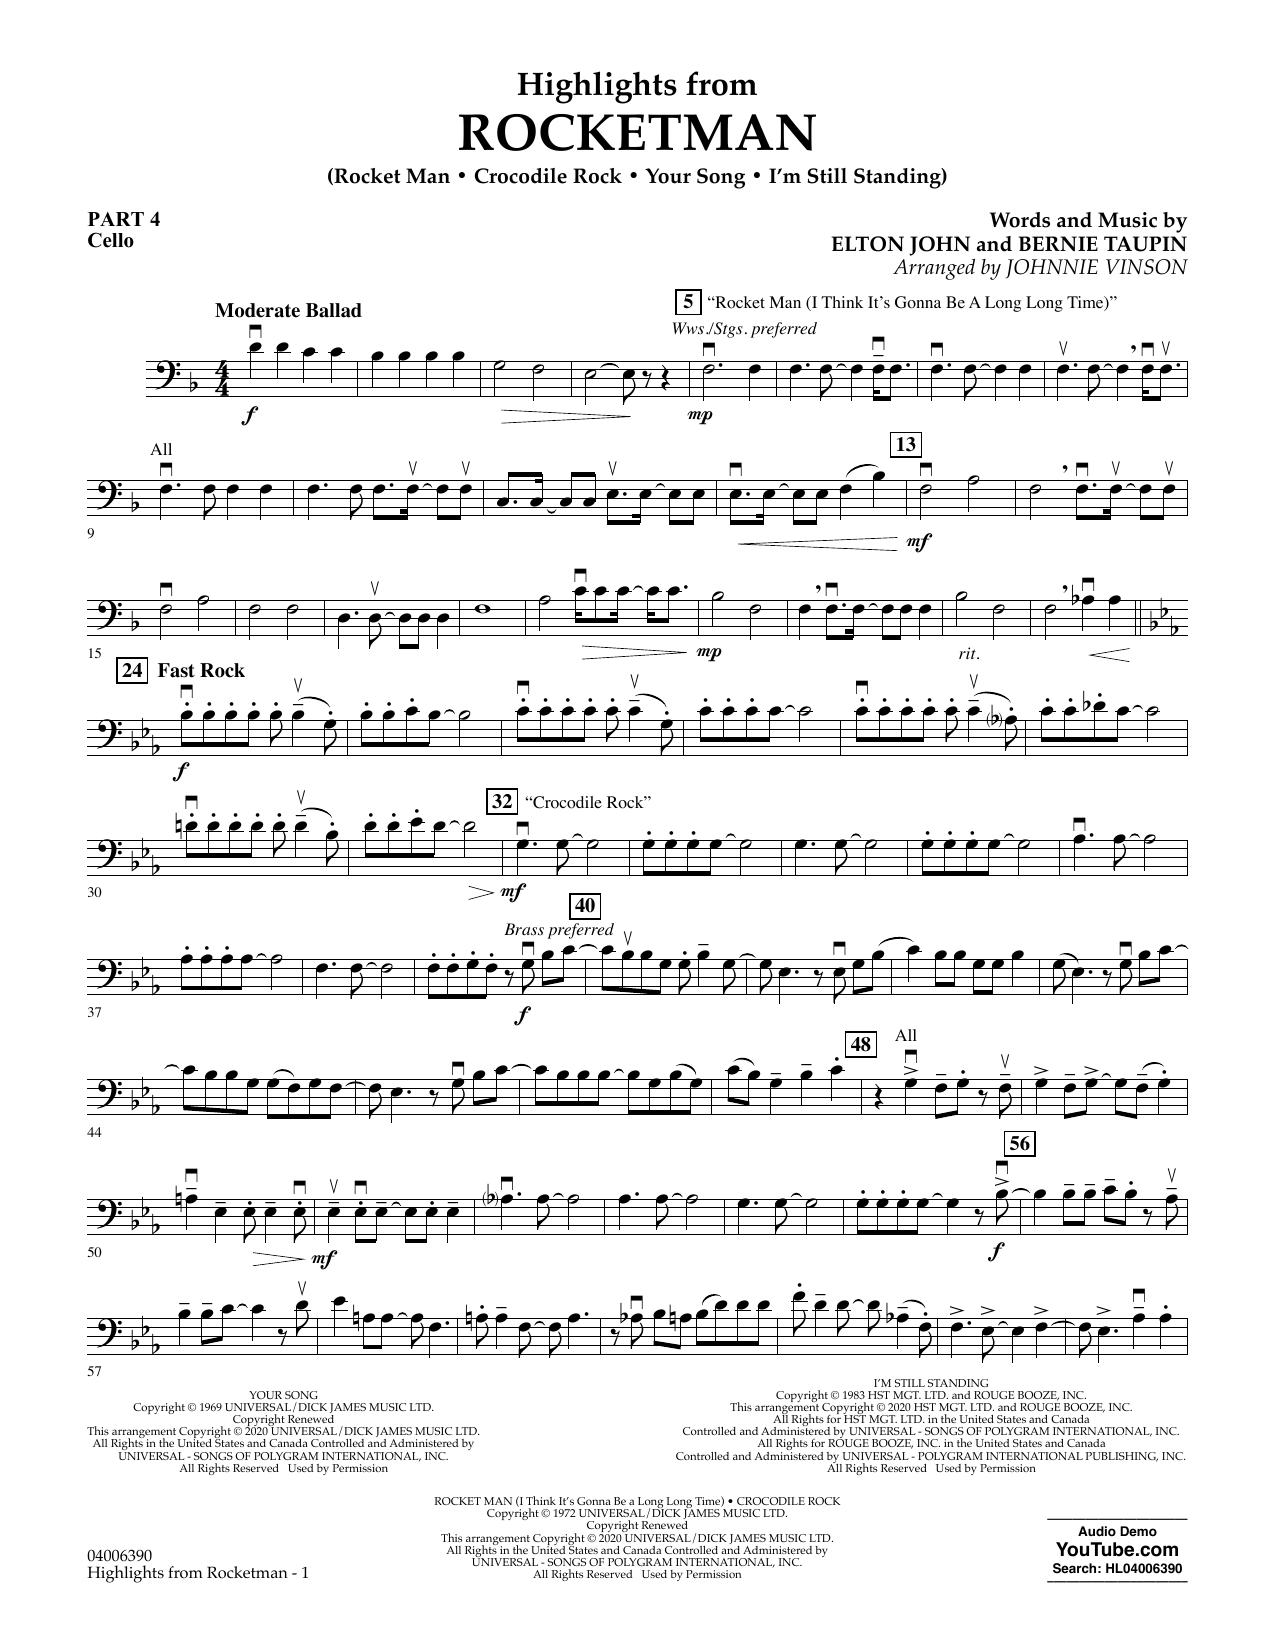 Highlights from Rocketman (arr. Johnnie Vinson) - Pt.4 - Cello (Flex-Band)